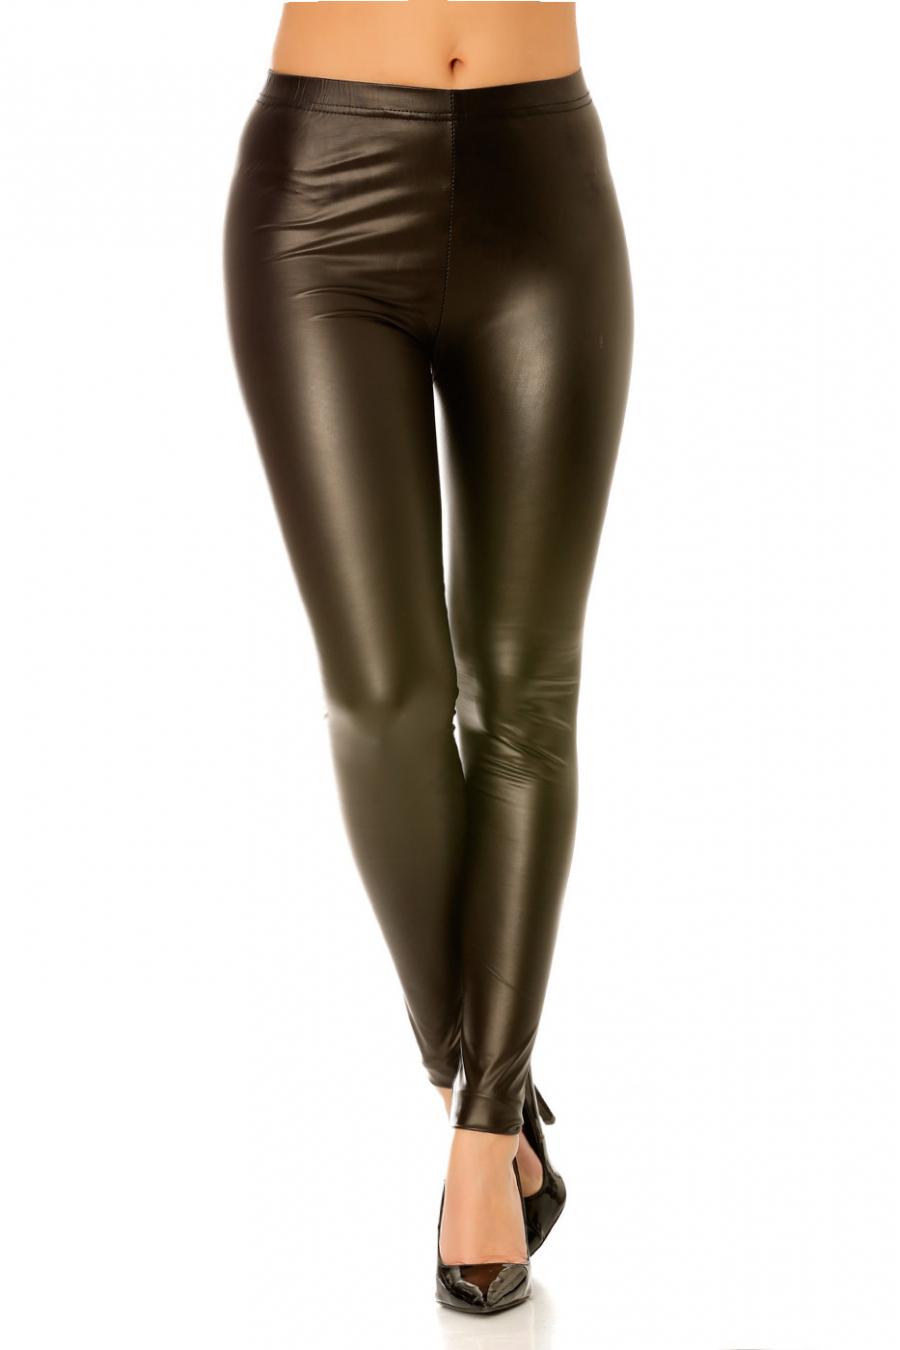 Leggings noir taille basse imitation cuir. 9909